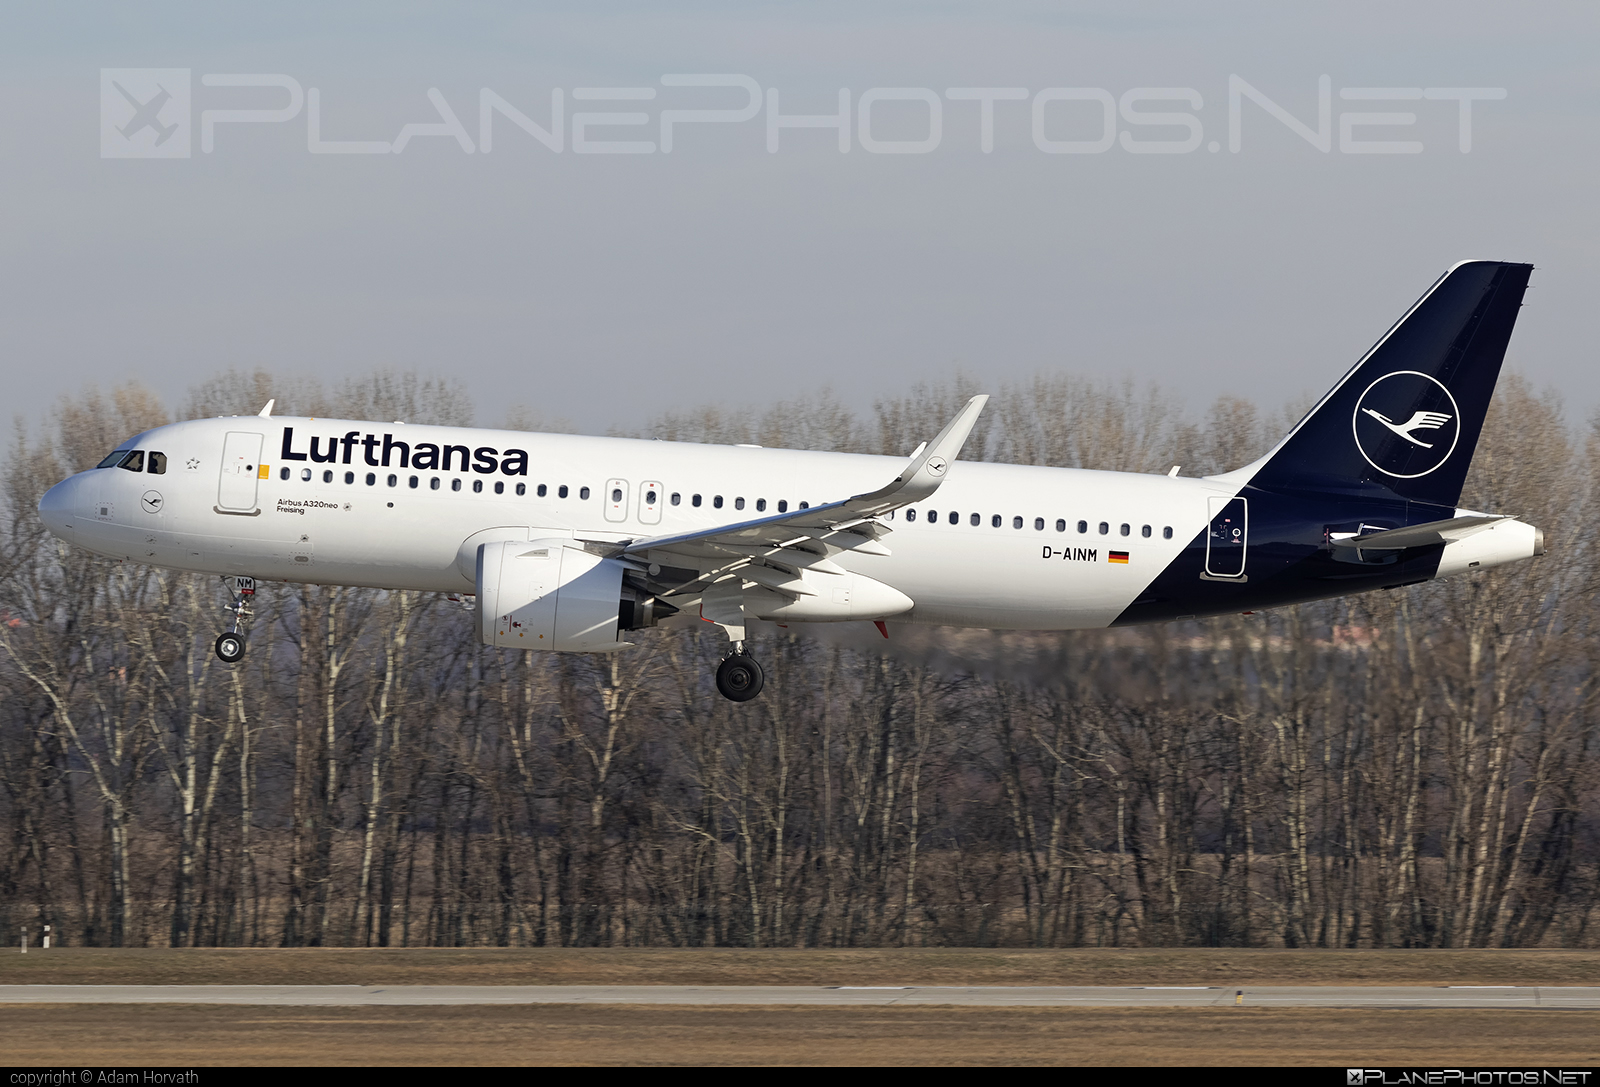 Airbus A320-271N - D-AINM operated by Lufthansa #a320 #a320family #a320neo #airbus #airbus320 #lufthansa